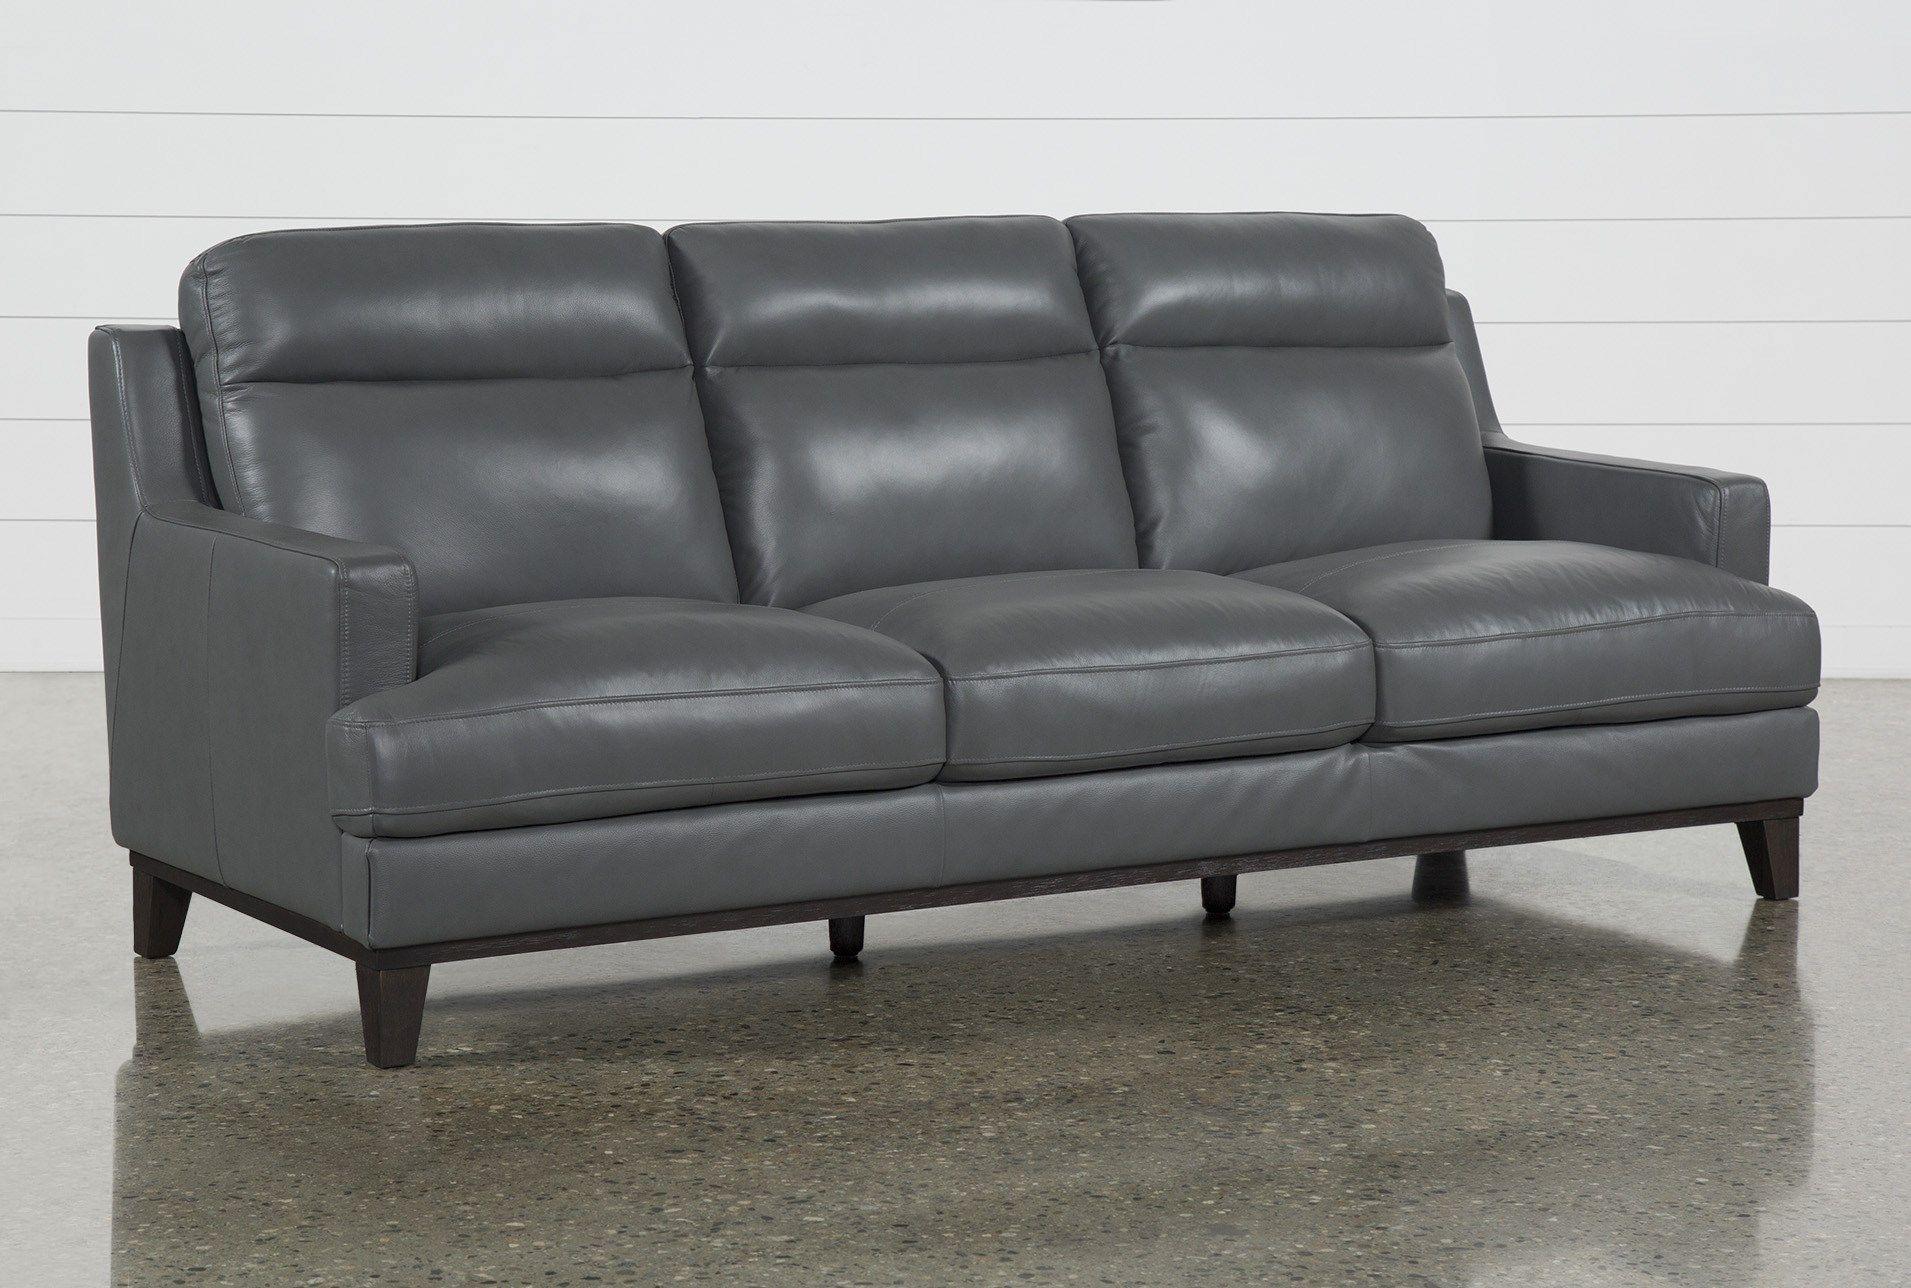 Kathleen Dark Grey Leather Sofa With Images Grey Leather Sofa Leather Sofa Leather Sofa Living